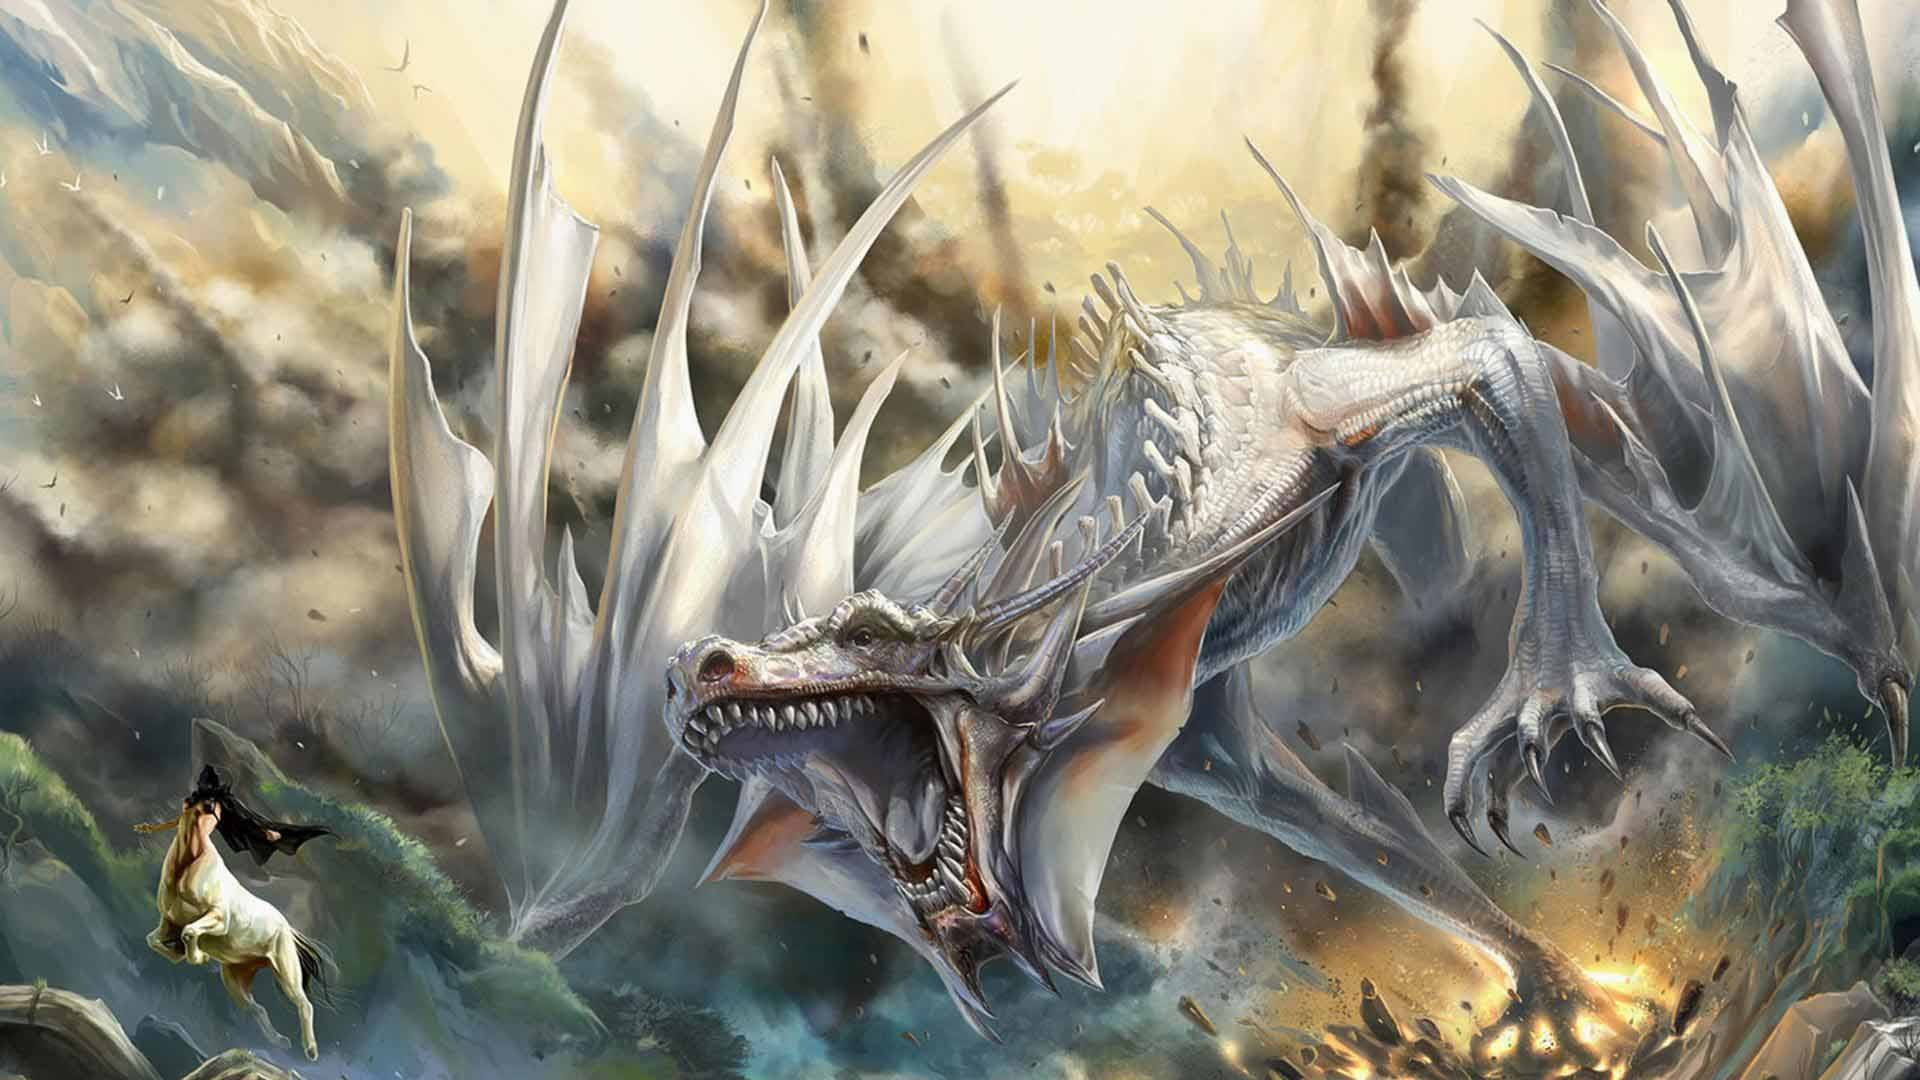 Wallpapers For > Black Dragon Wallpaper Hd 1080p